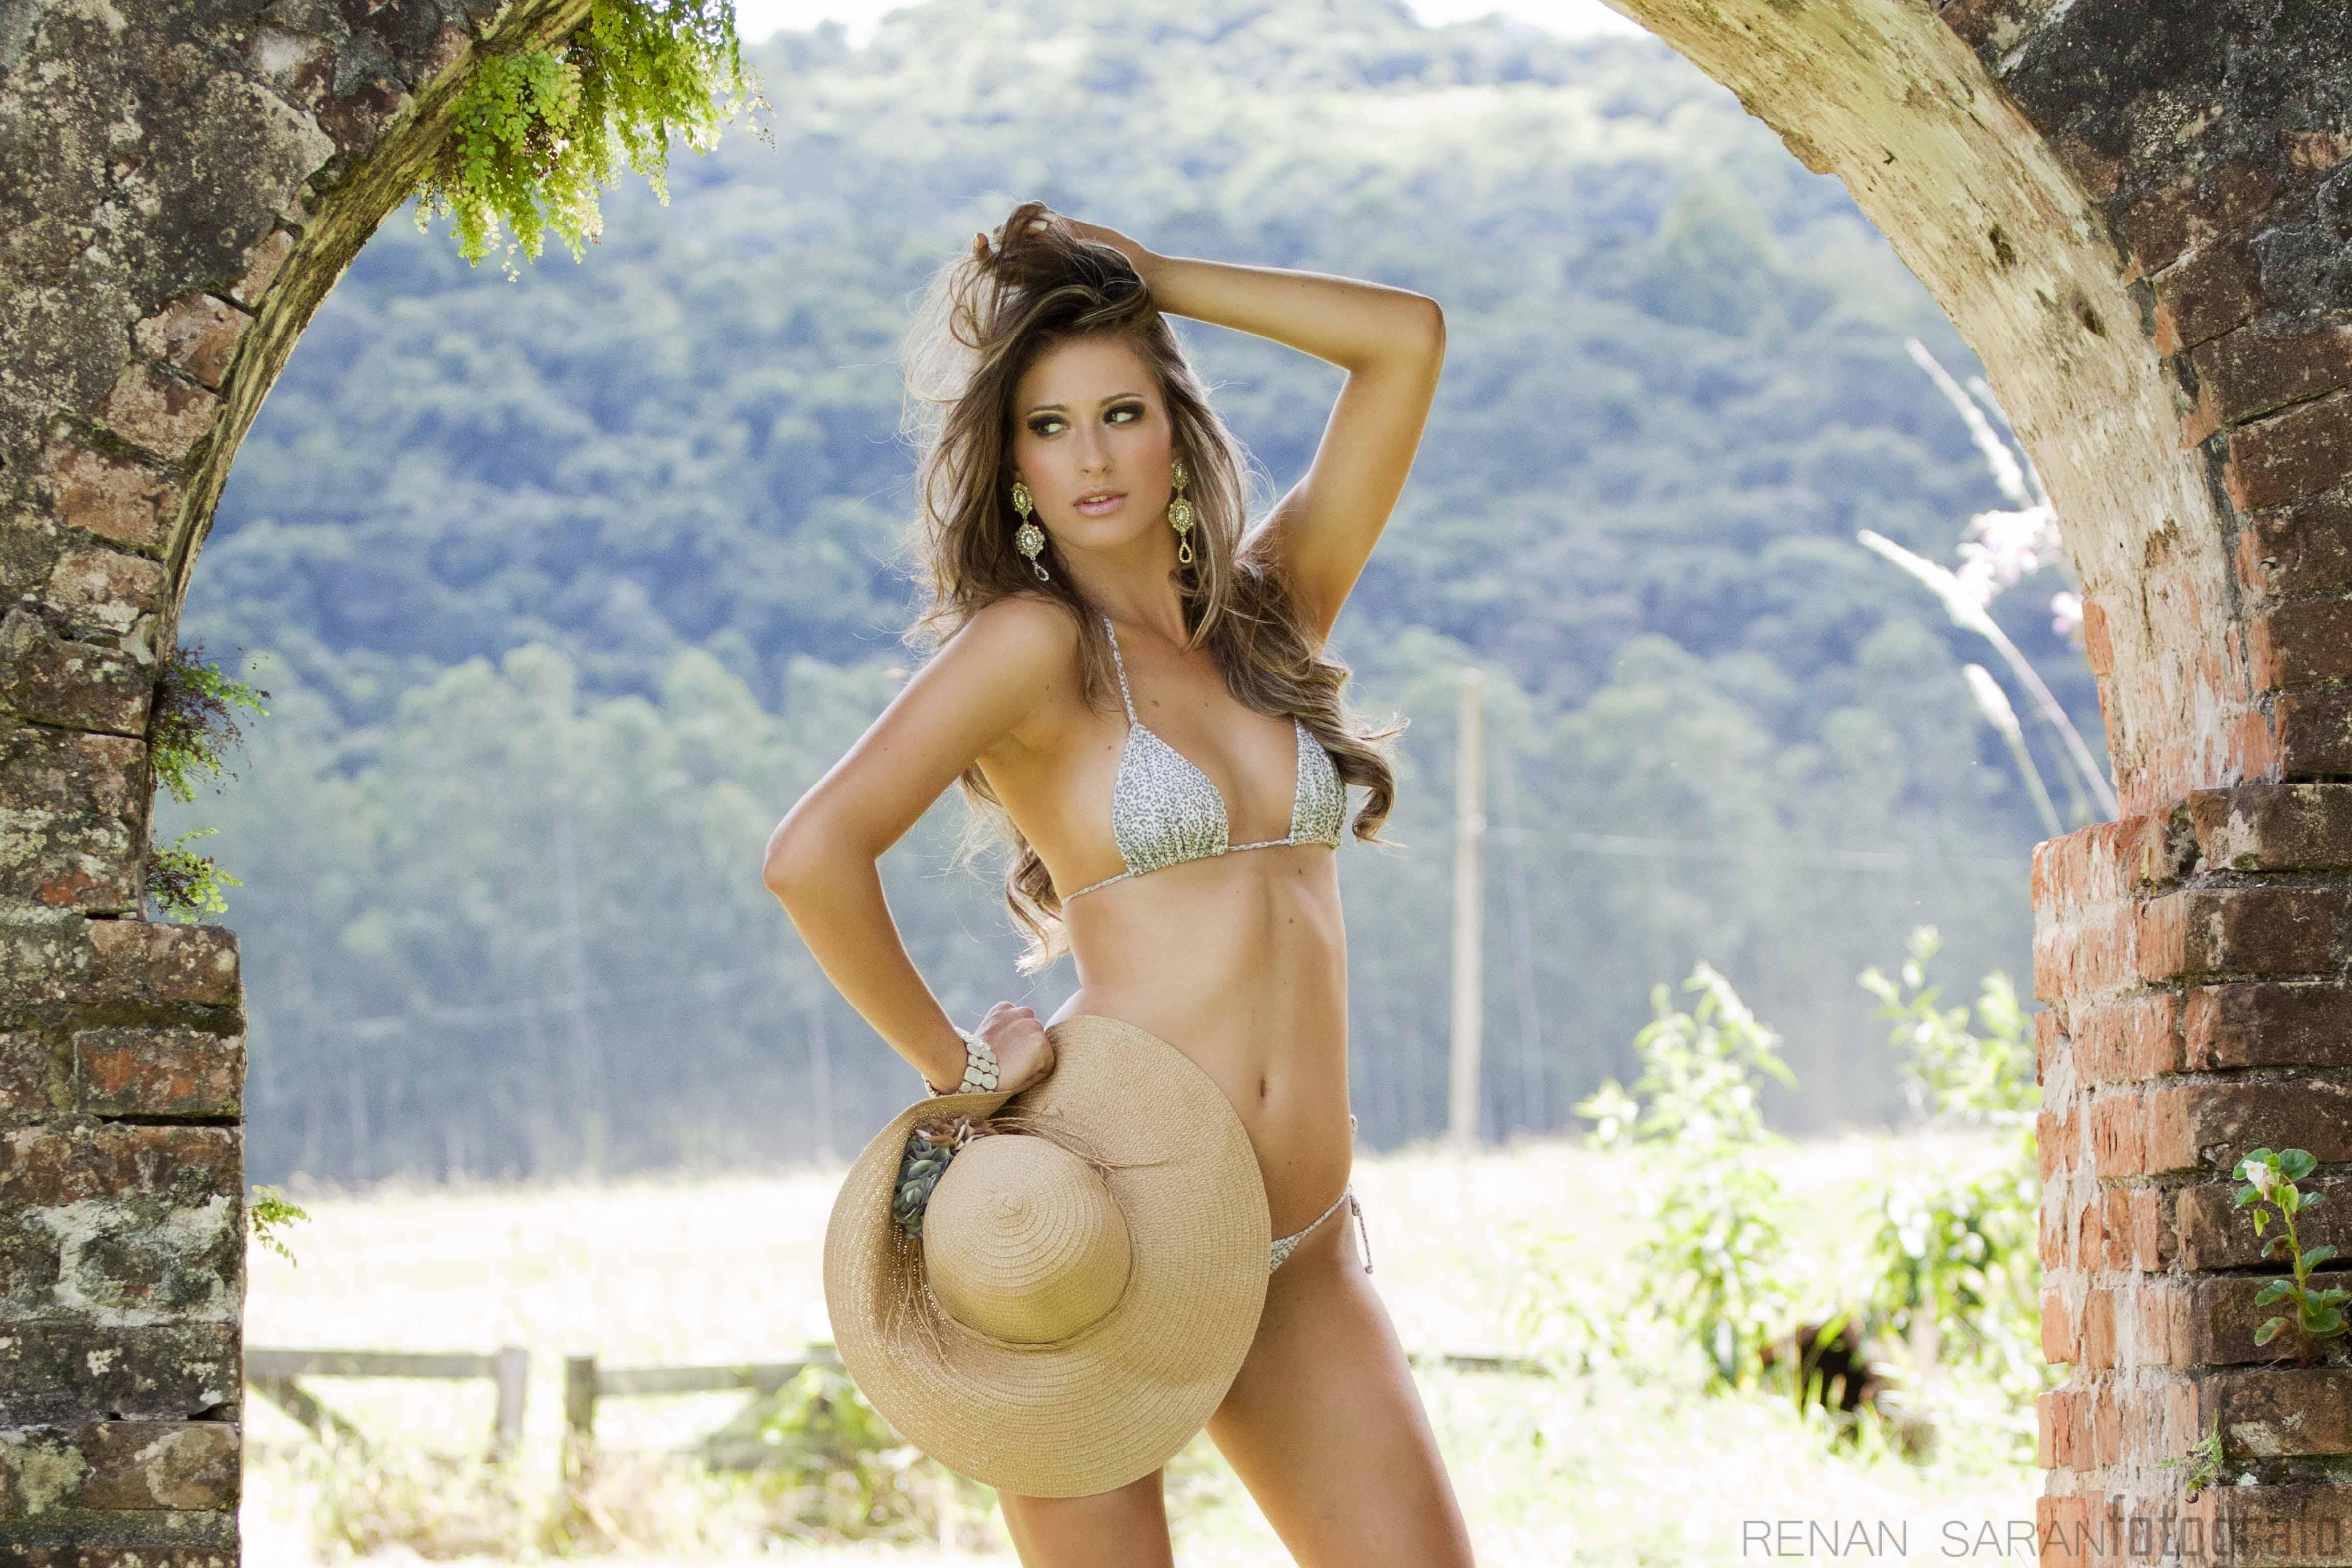 lais berte, top 3 de rainha hispanoamericana 2017, top 2 de miss eco international 2016. - Página 2 Xvdhqgmm